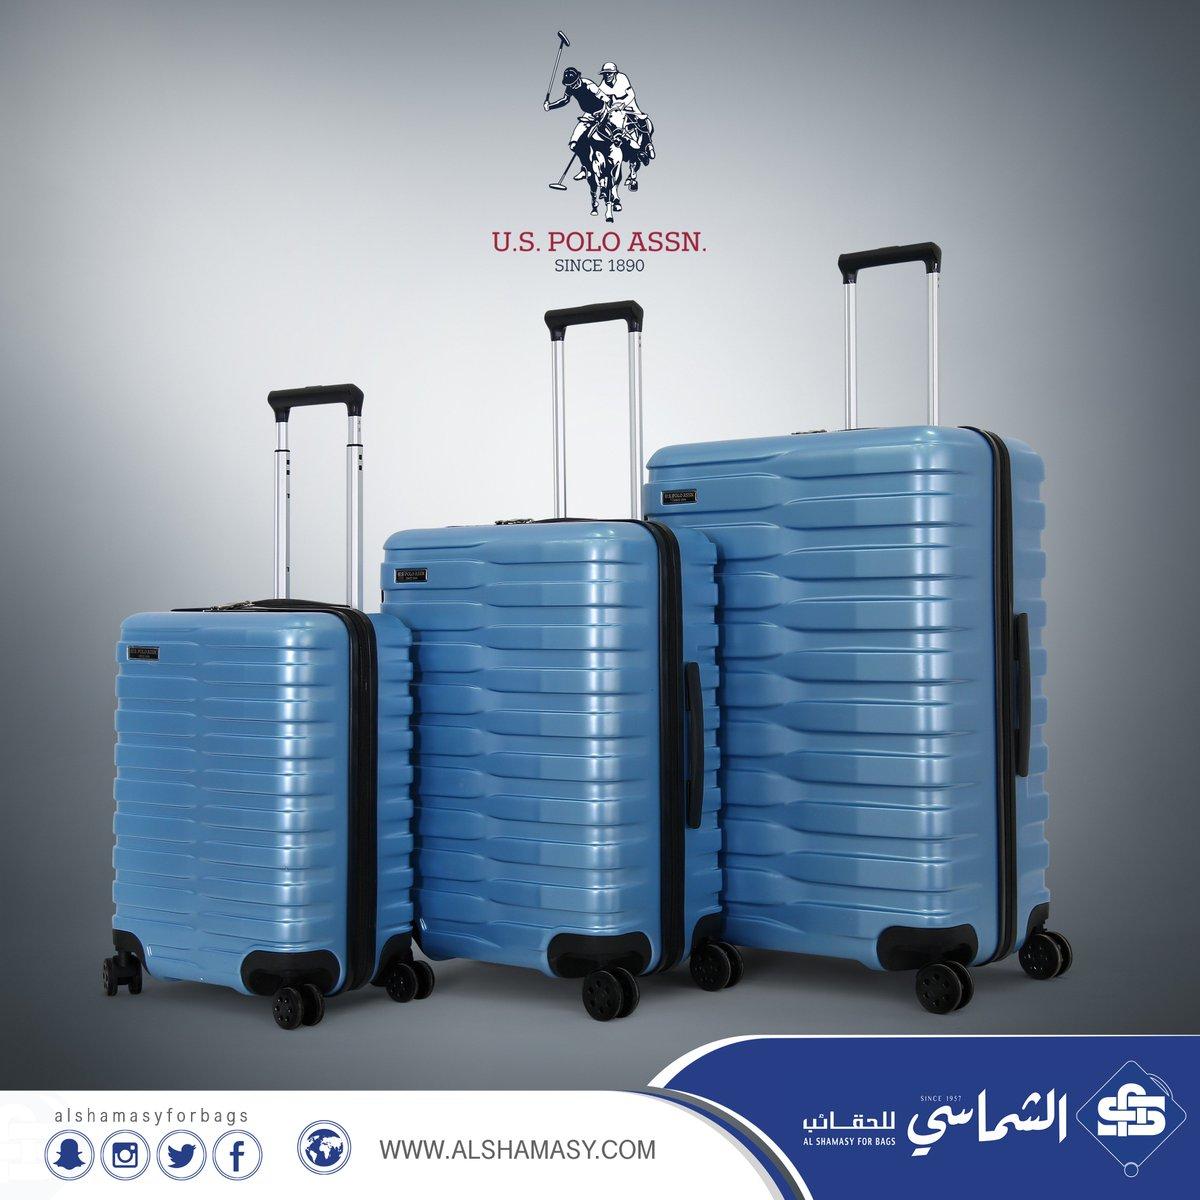 b176197a7 وصل حديثاً طقم حقائب سفر ماركة يو اس بولو اسسن مصنوعة من البولي كاربون  مقسمة من